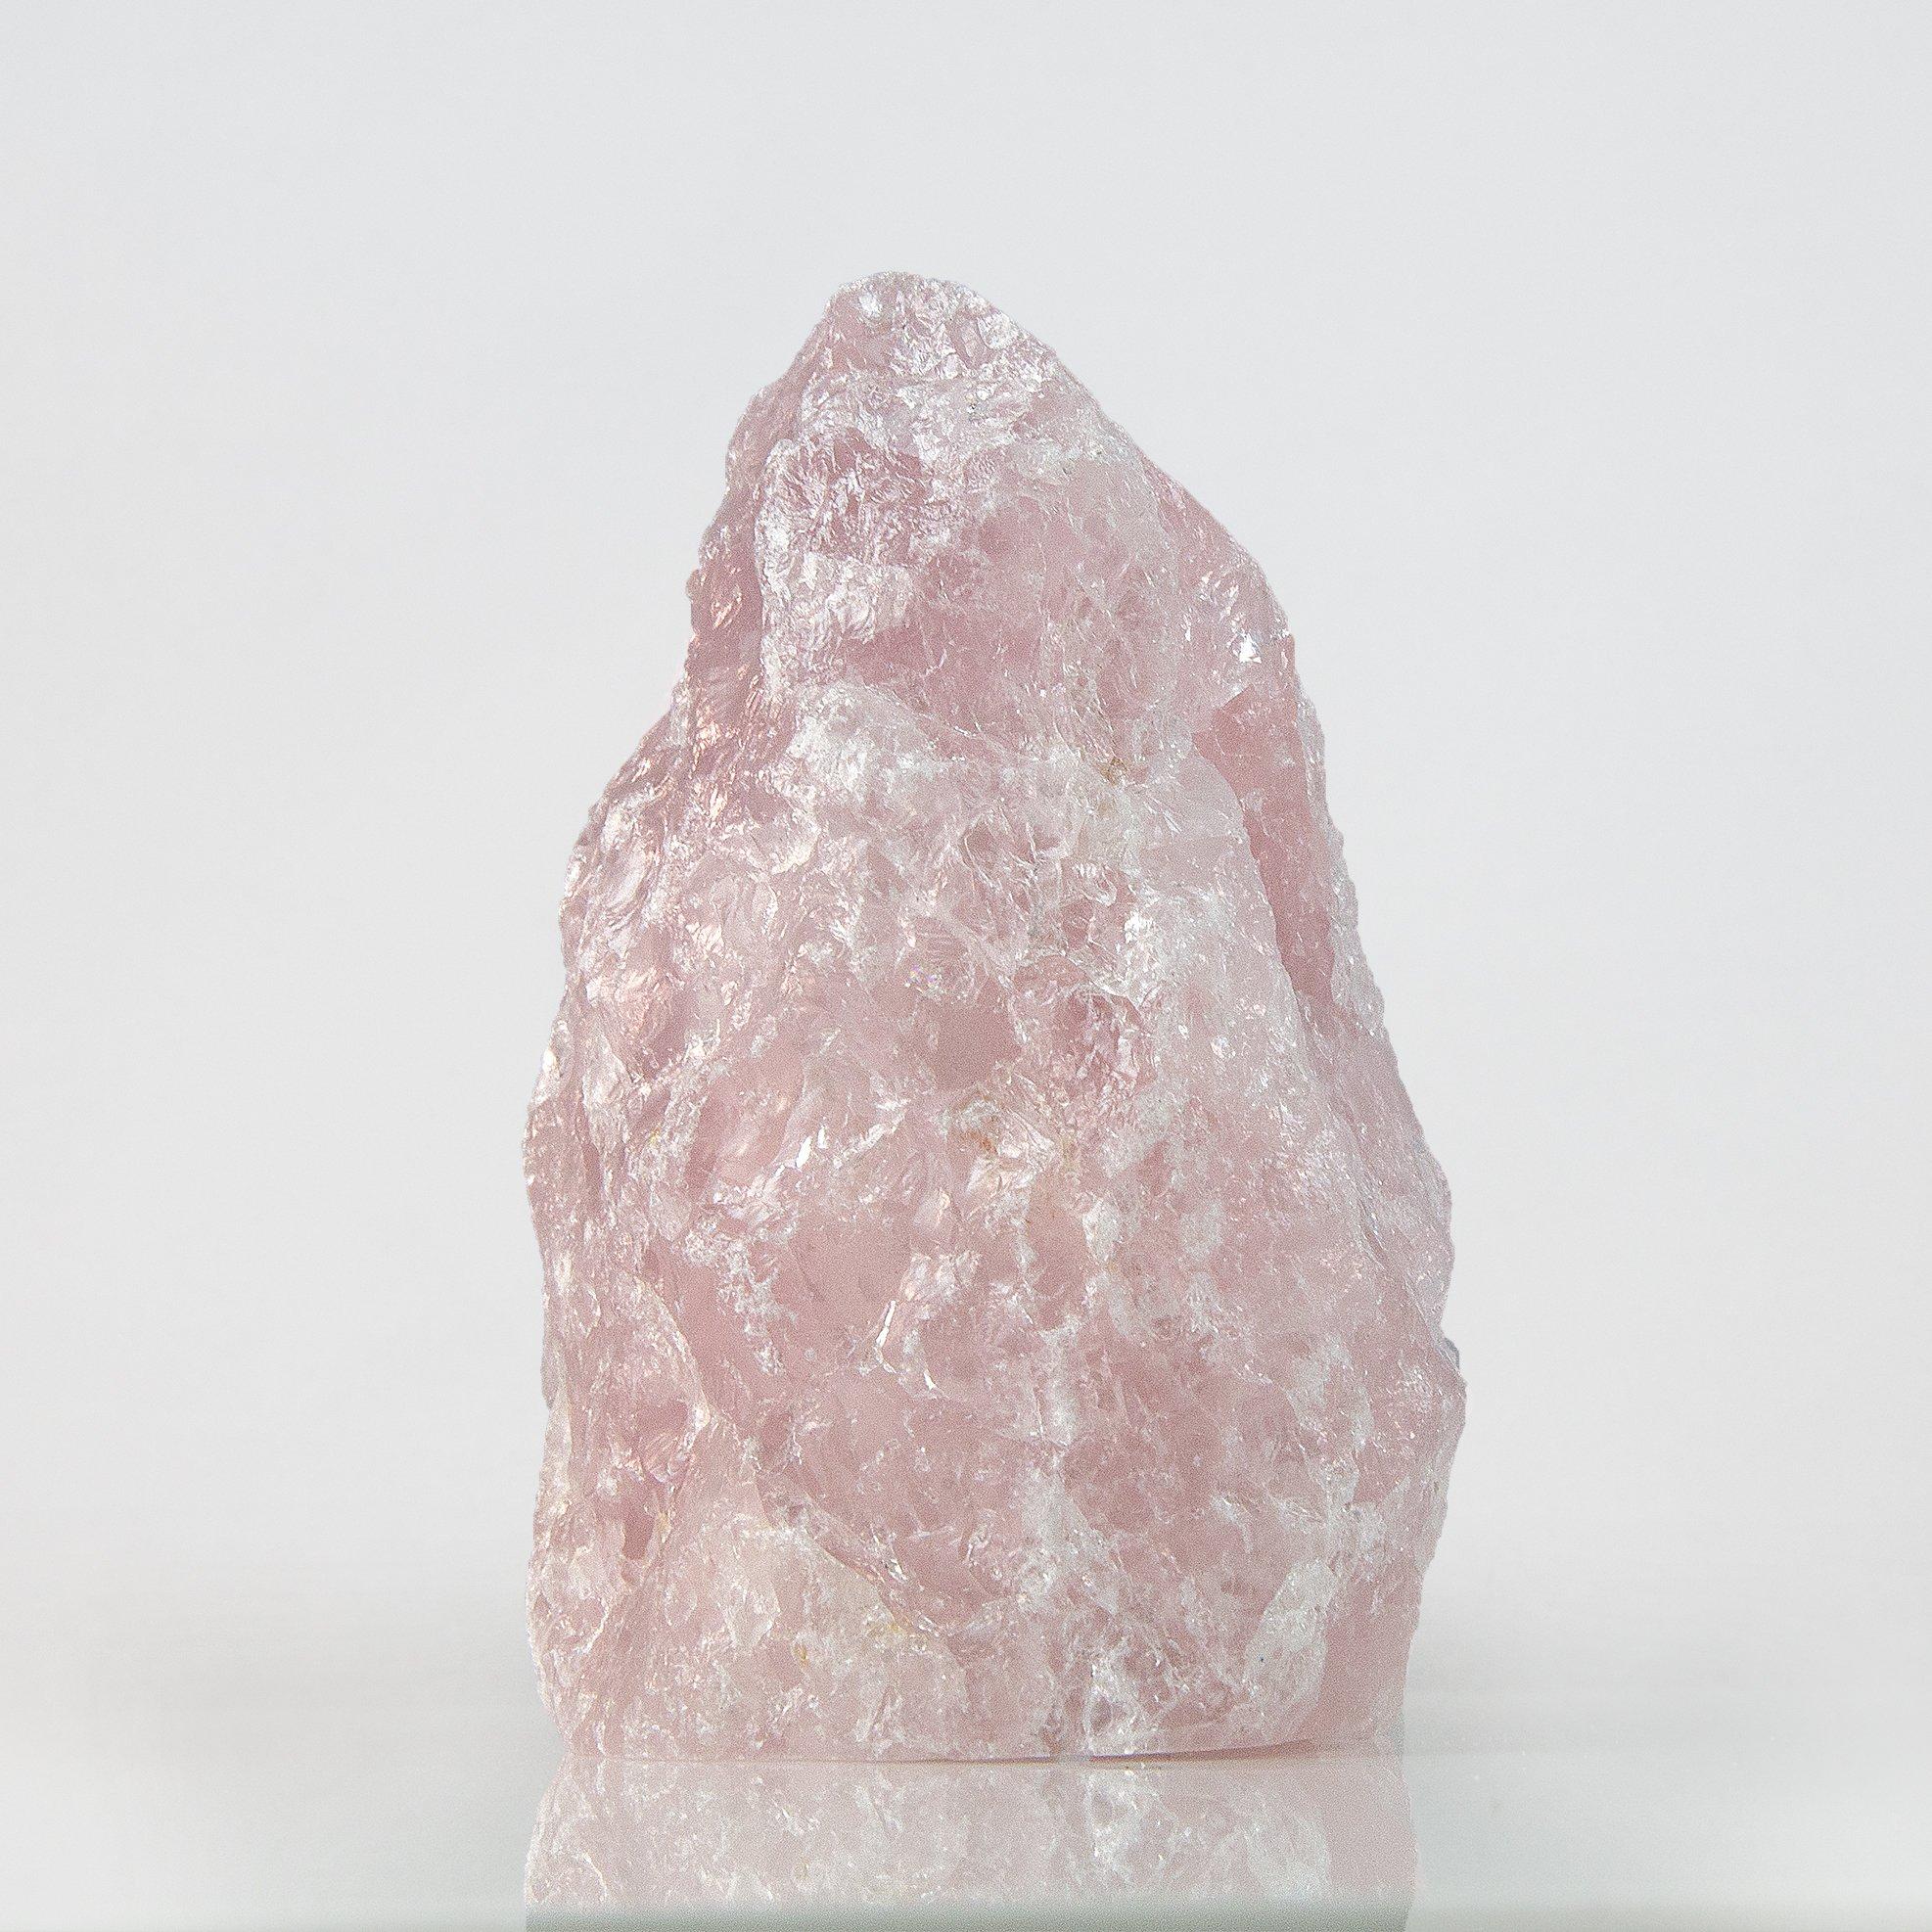 Beverly Oaks Rose Quartz Crystal Lamp - Pink Quartz Light - The Original Love Stone